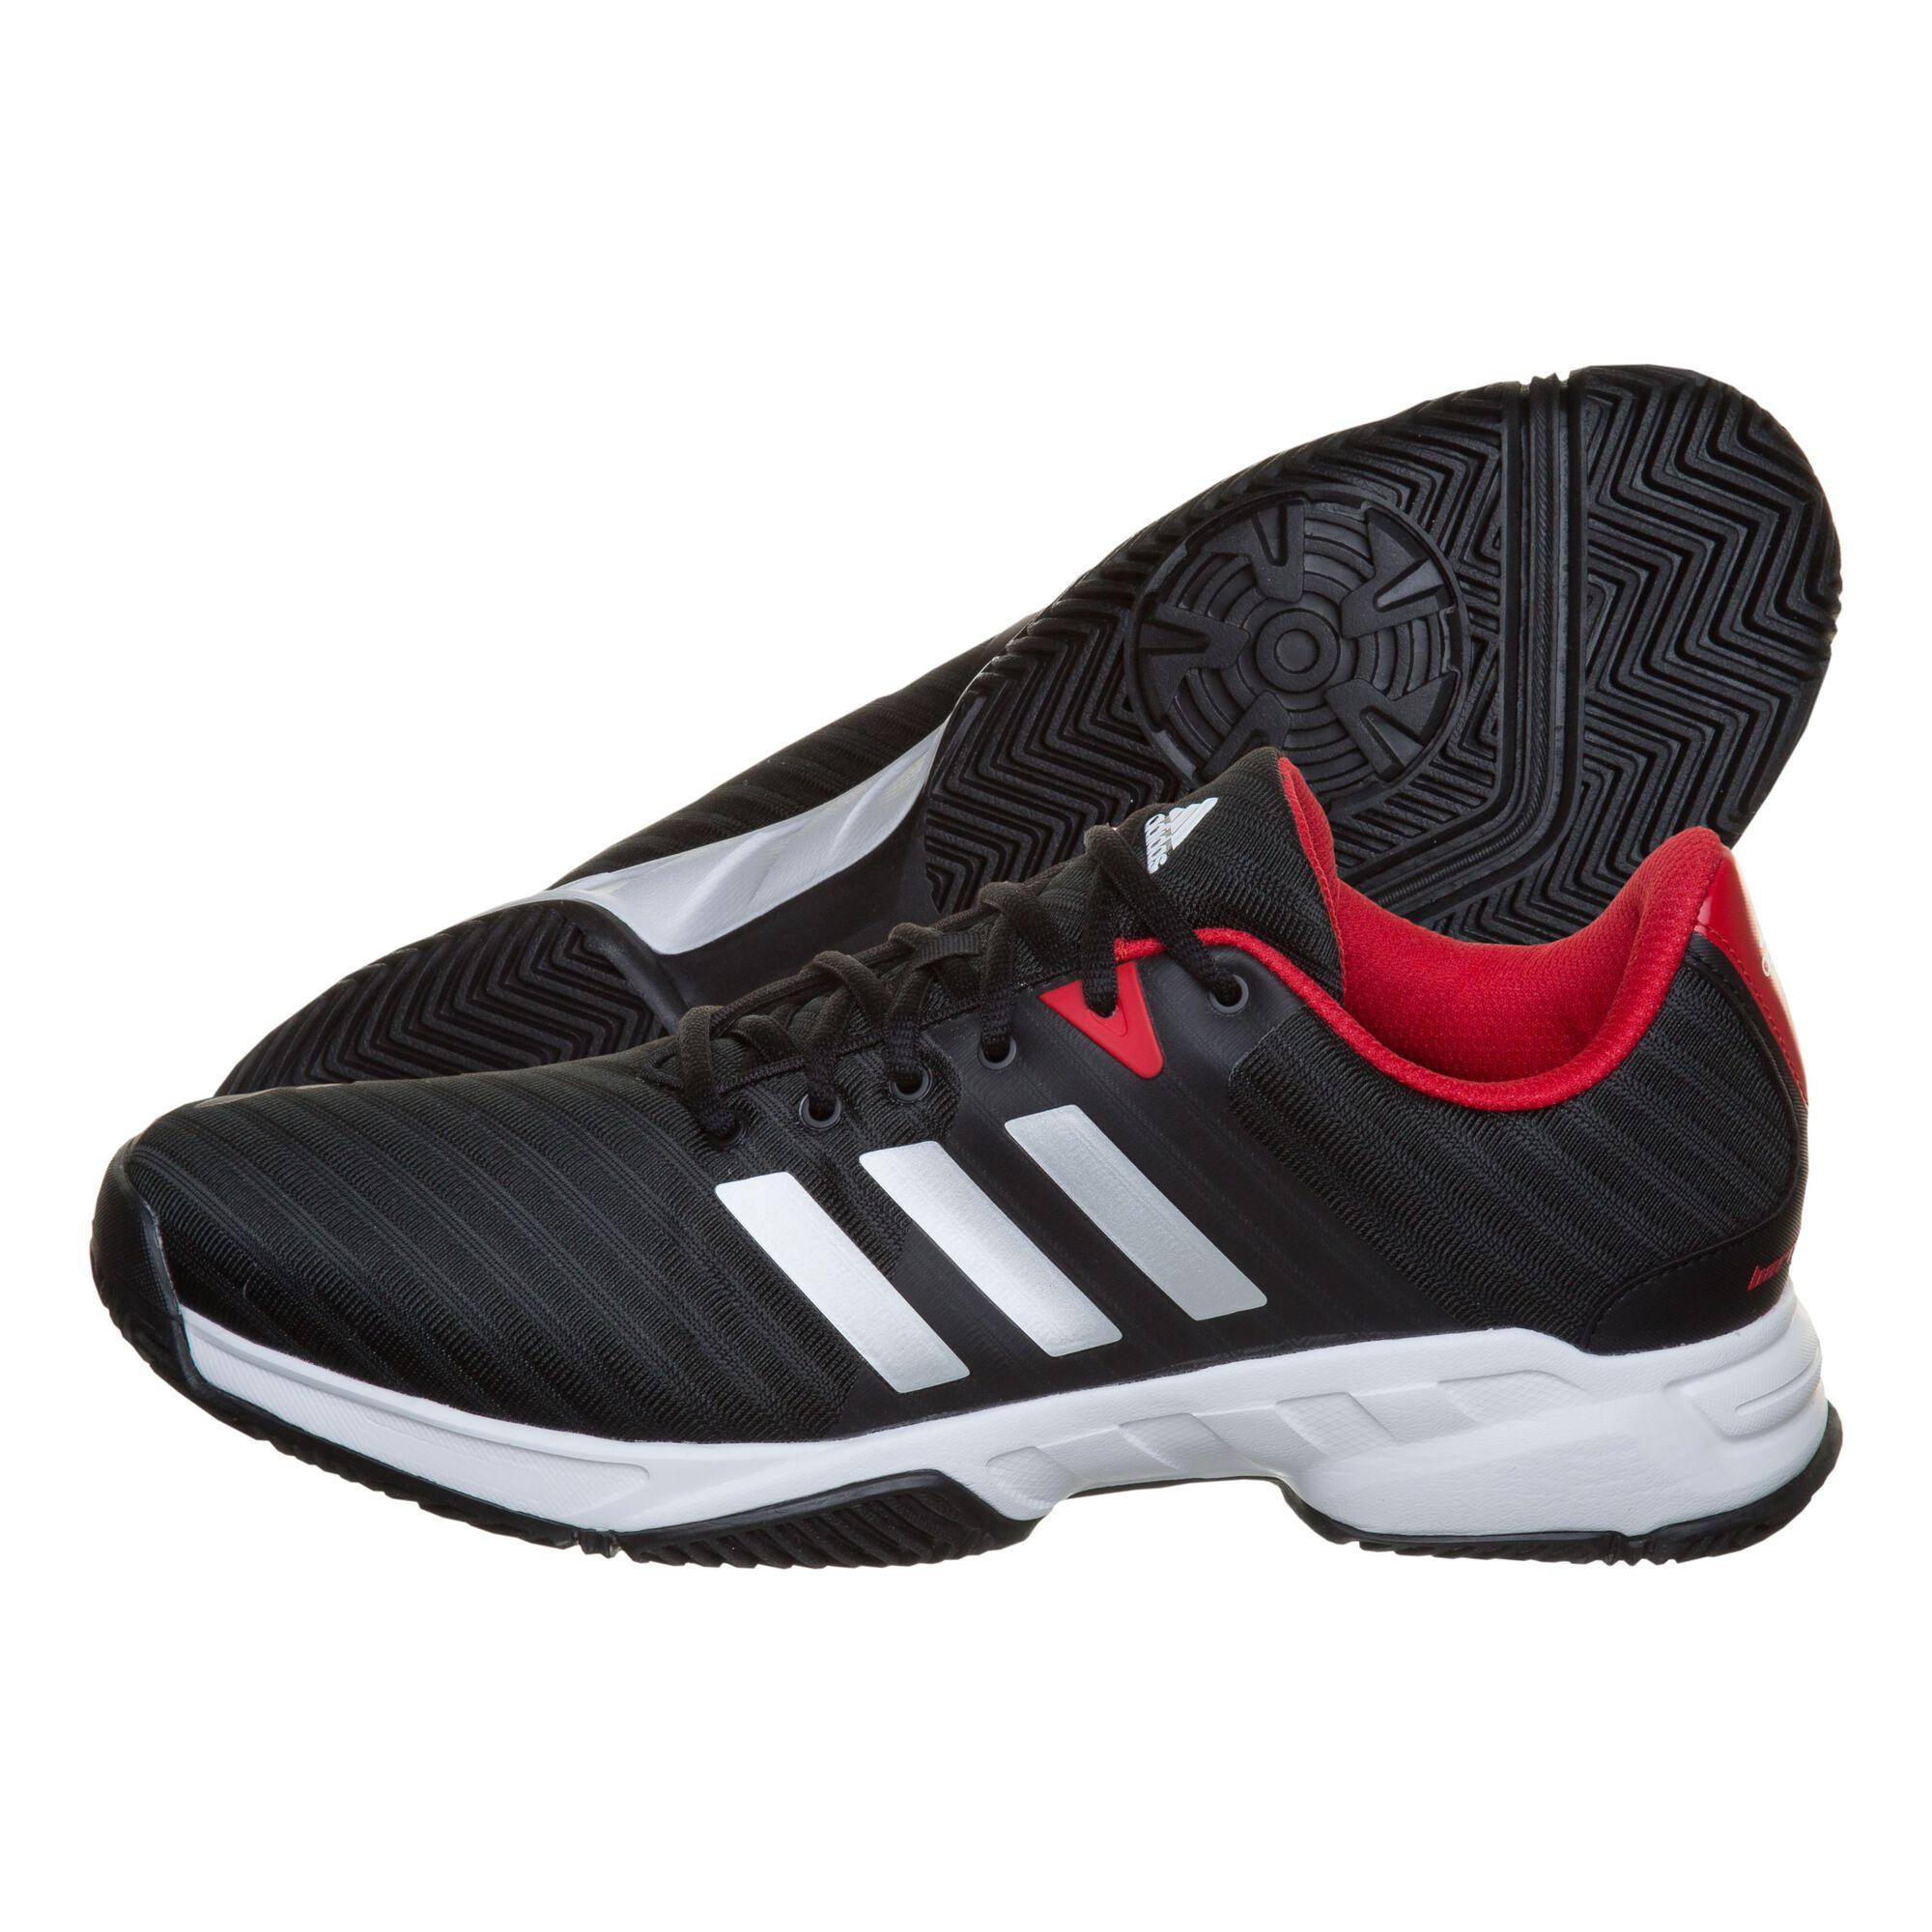 official photos cc923 6c51c adidas  adidas  adidas  adidas  adidas  adidas  adidas  adidas  adidas   adidas. Barricade Court 3 Men Barricade Court ...